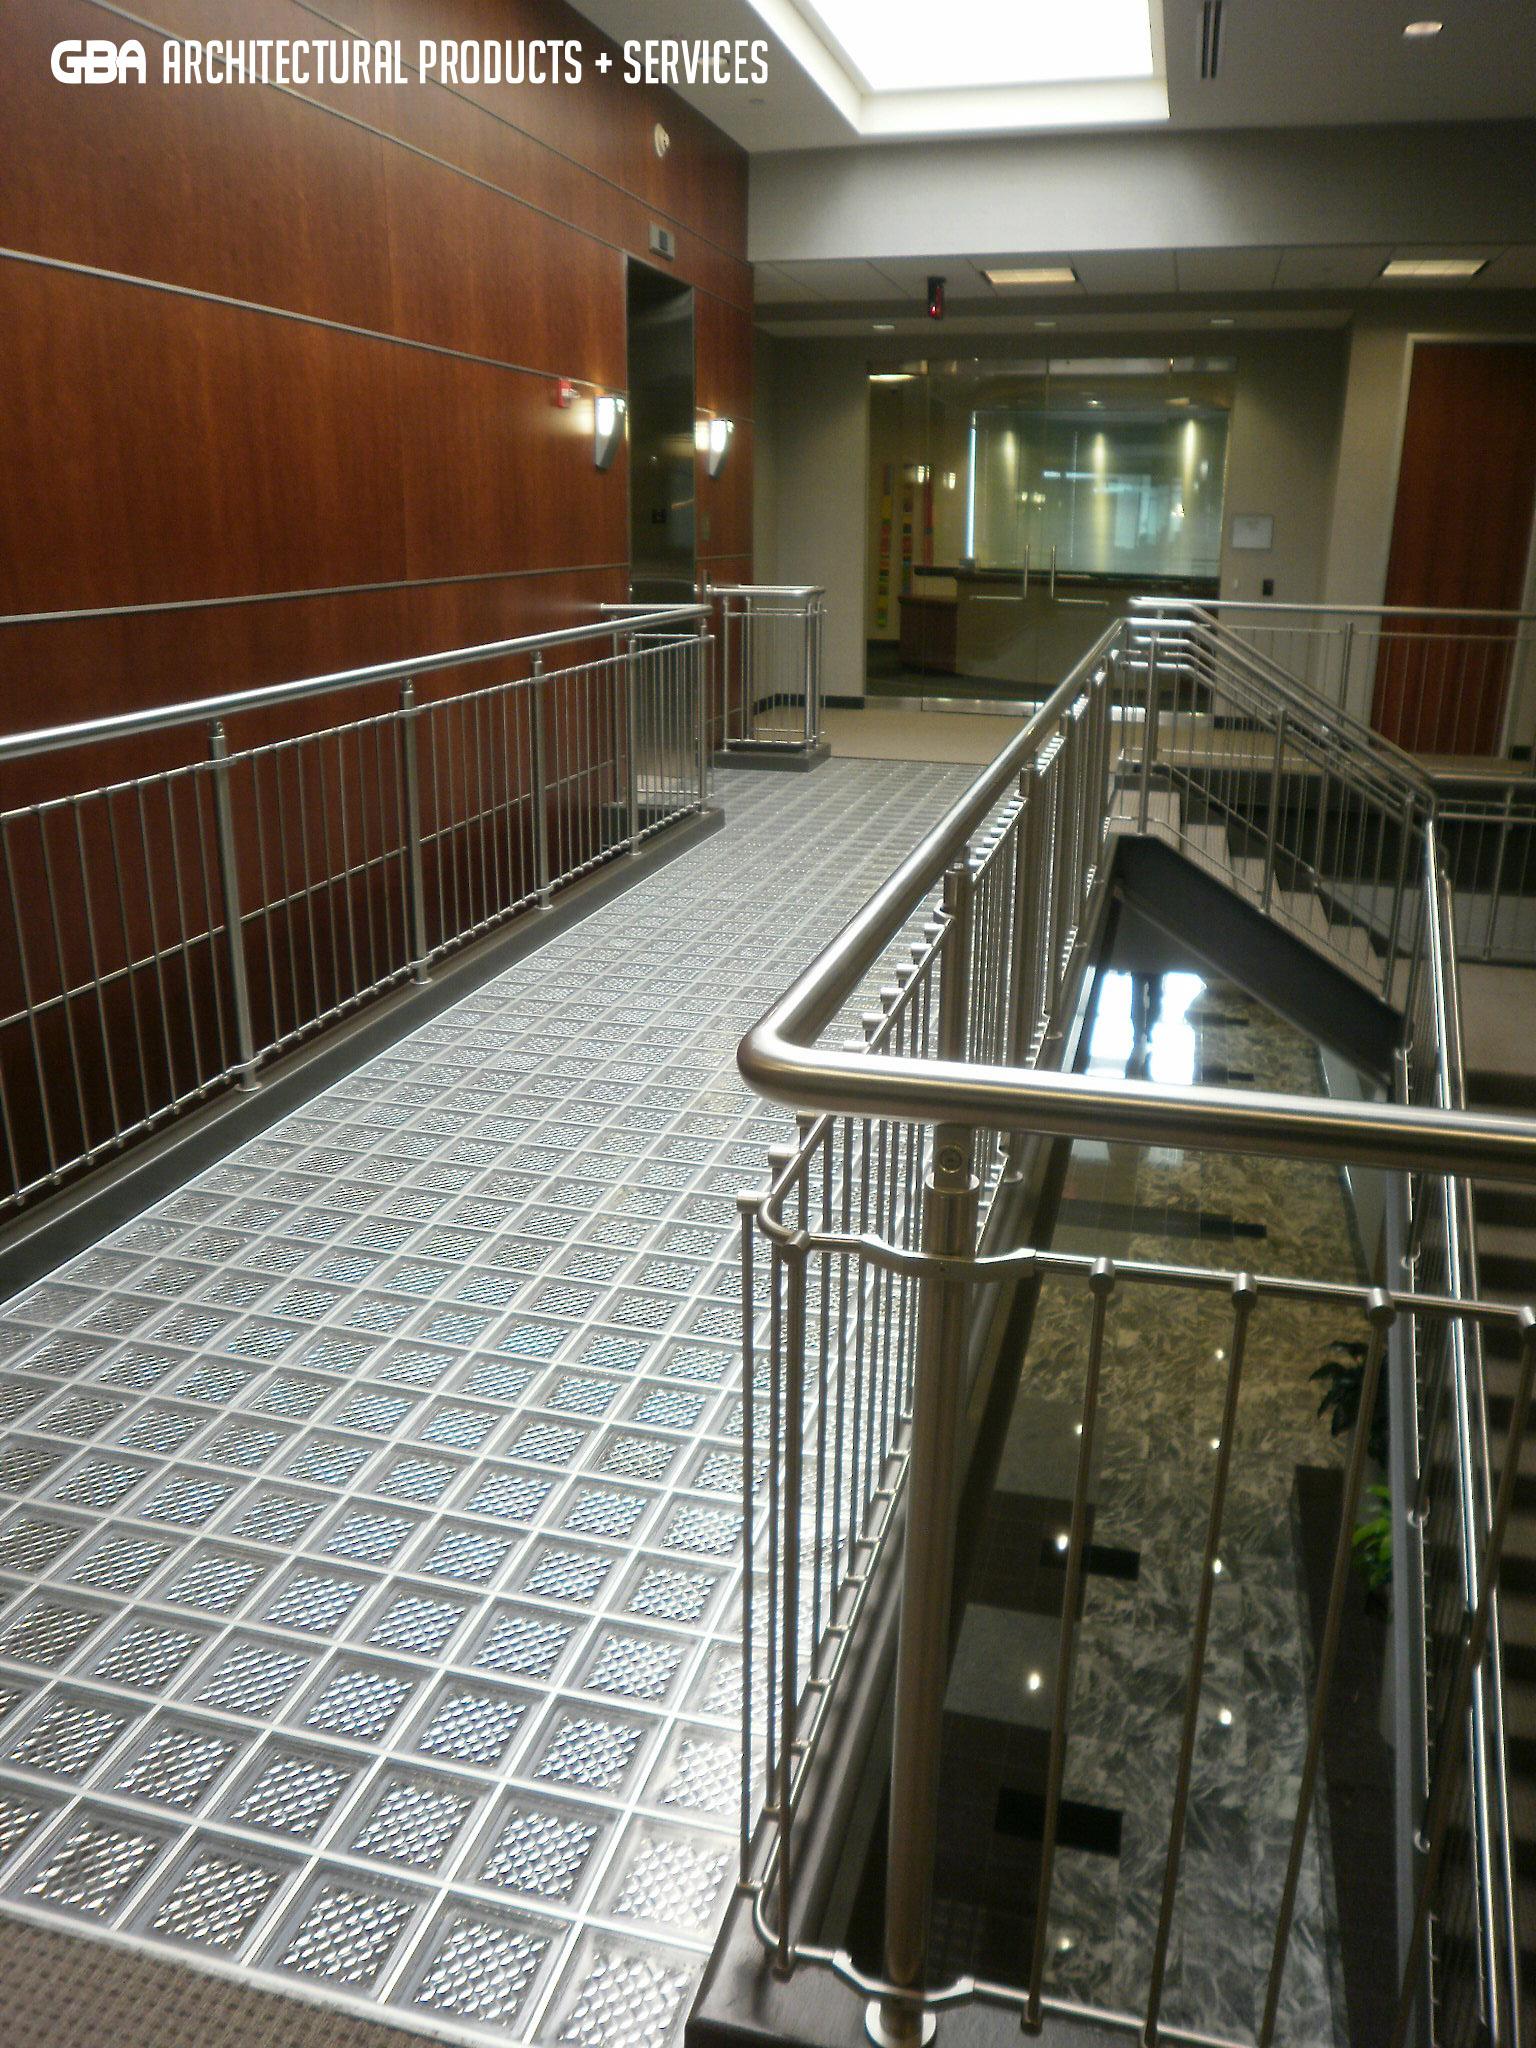 2017-09-26 23-00 Copy of Xlincoln-park-office-complex-herndon-va-series-of-ibp-floor-grids-4_6944930294_o